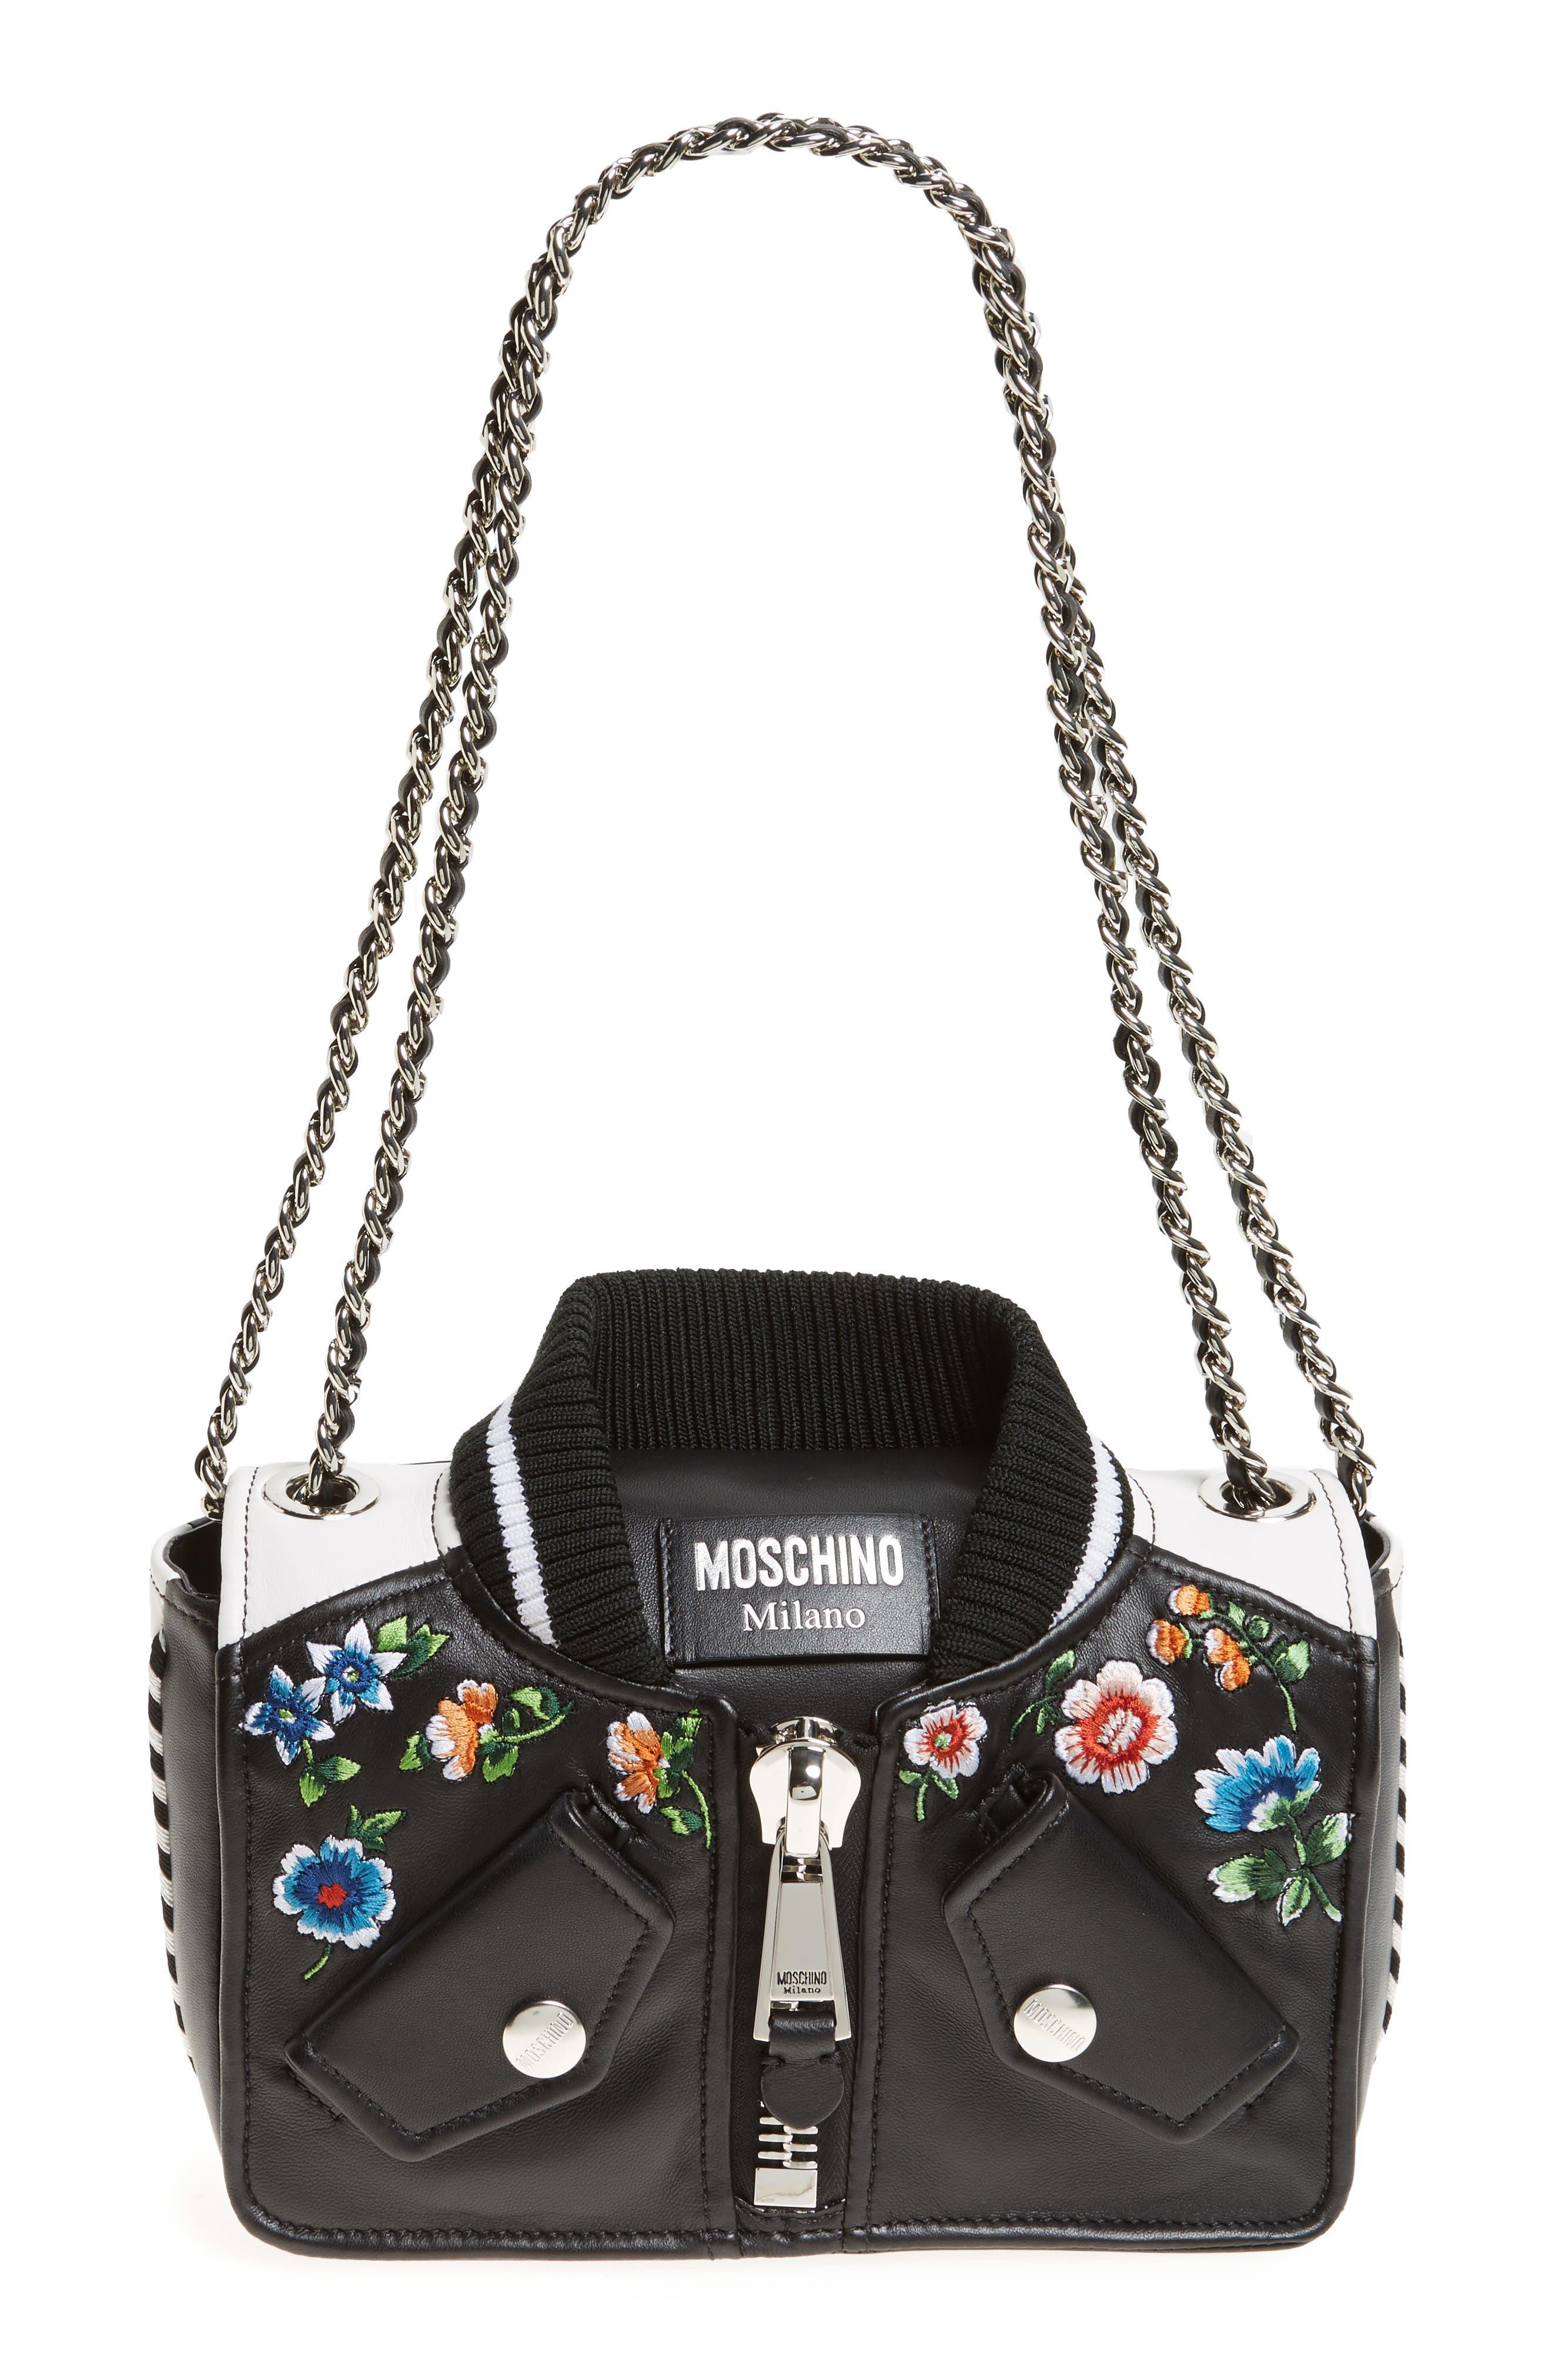 Alternate Image 1 Selected - Moschino Embroidered Floral Bomber Jacket Leather Shoulder Bag